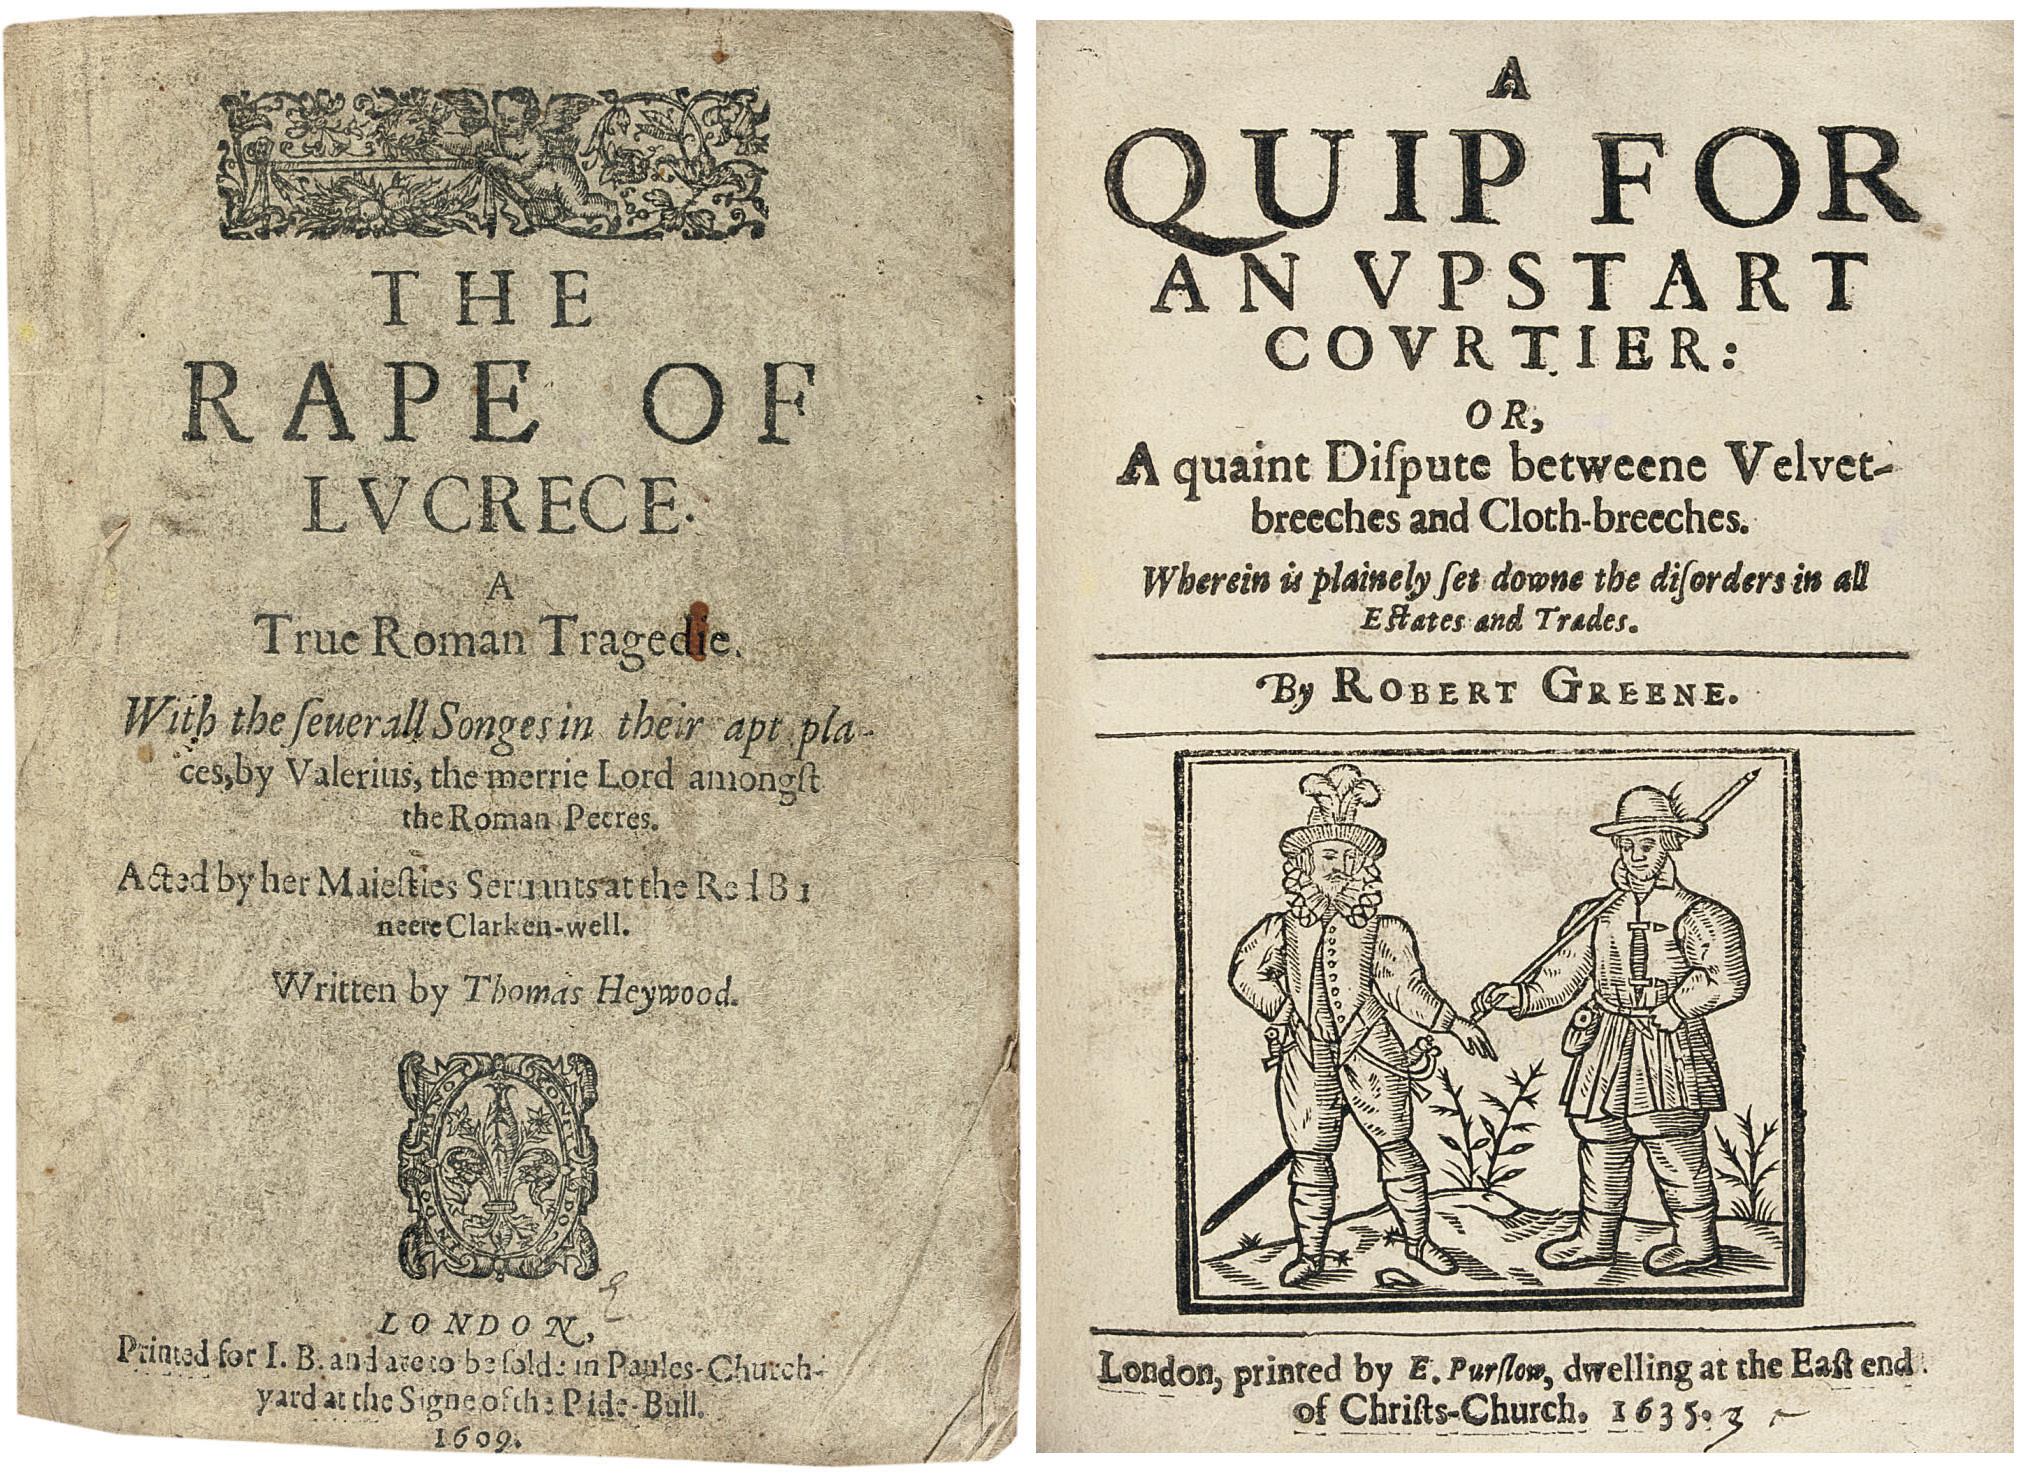 HEYWOOD, Thomas (c. 1573-1641)